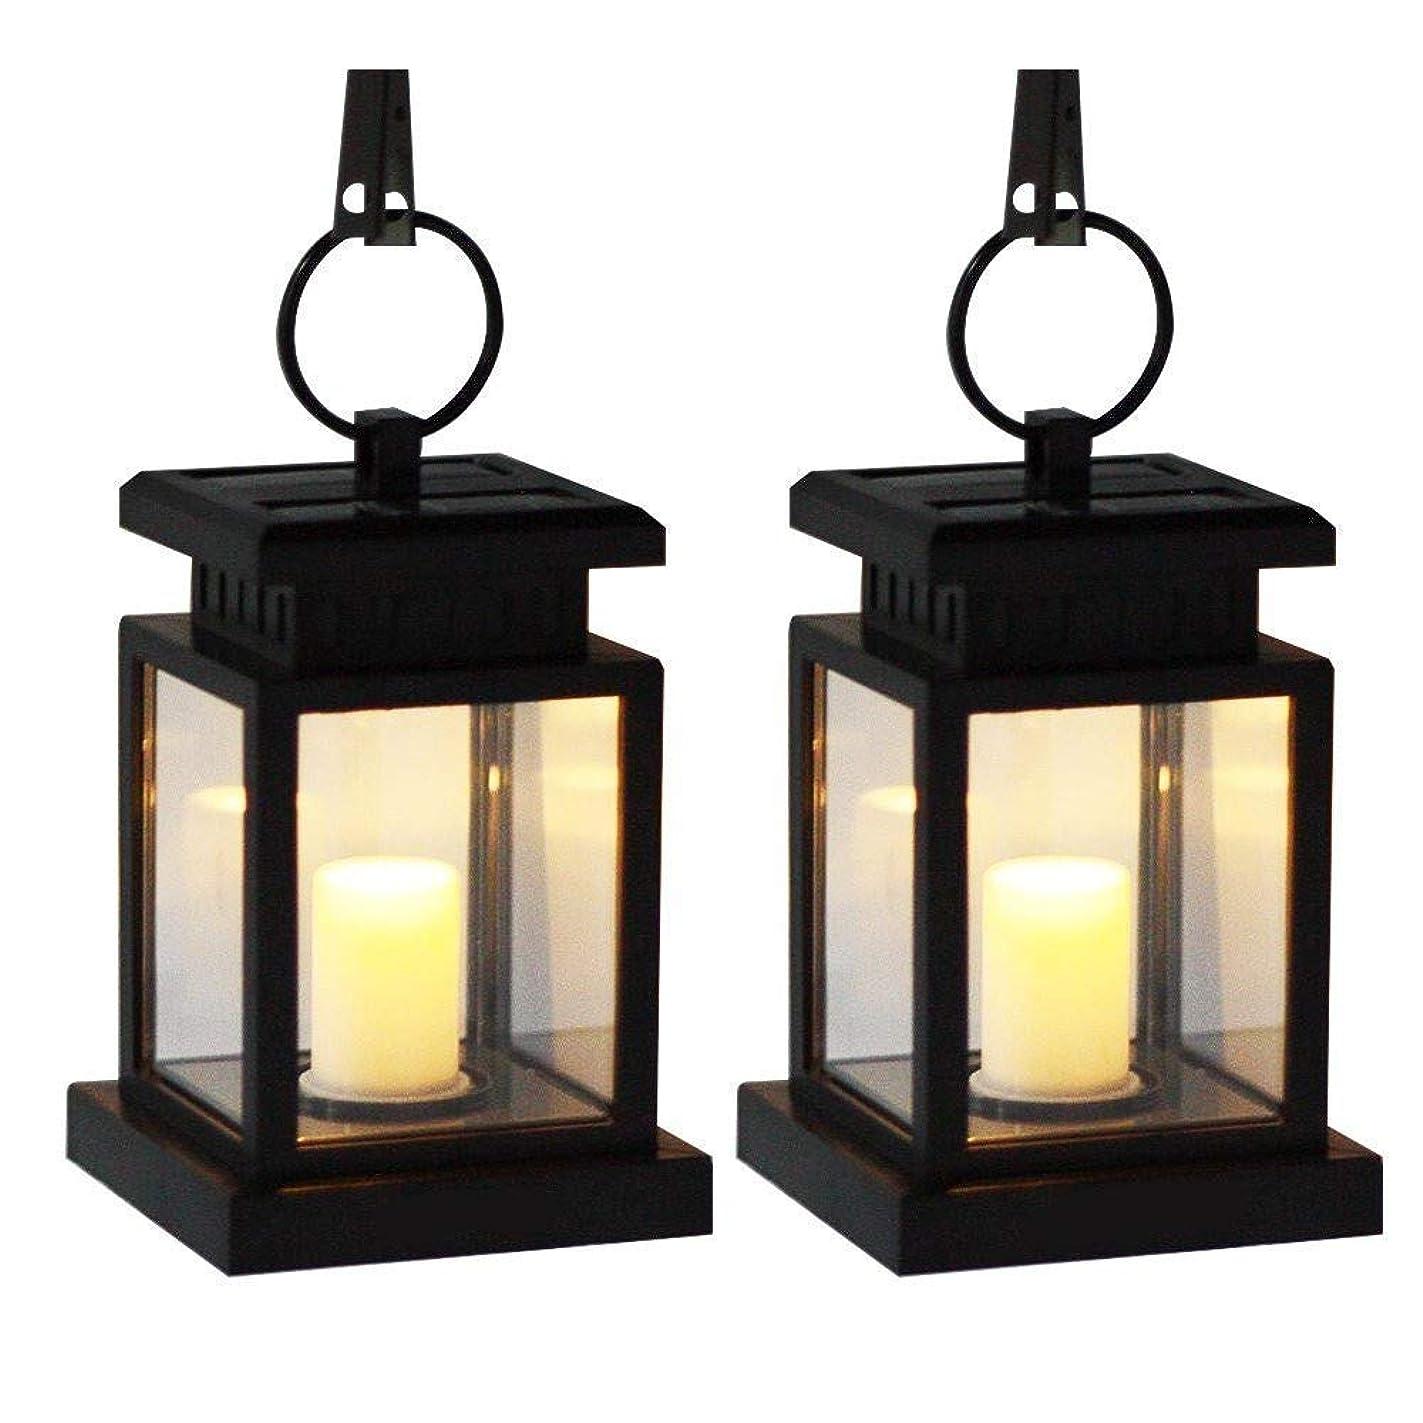 AMEI Solar Lantern, Solar LED Deck Light, Outdoor Hanging Solar Garden Light, Patio Lanterns, Yard Decorations,Hanging Solar Lantern with Clamp for Patio Umbrella Deck Lighting & Decoration (2 Pack)